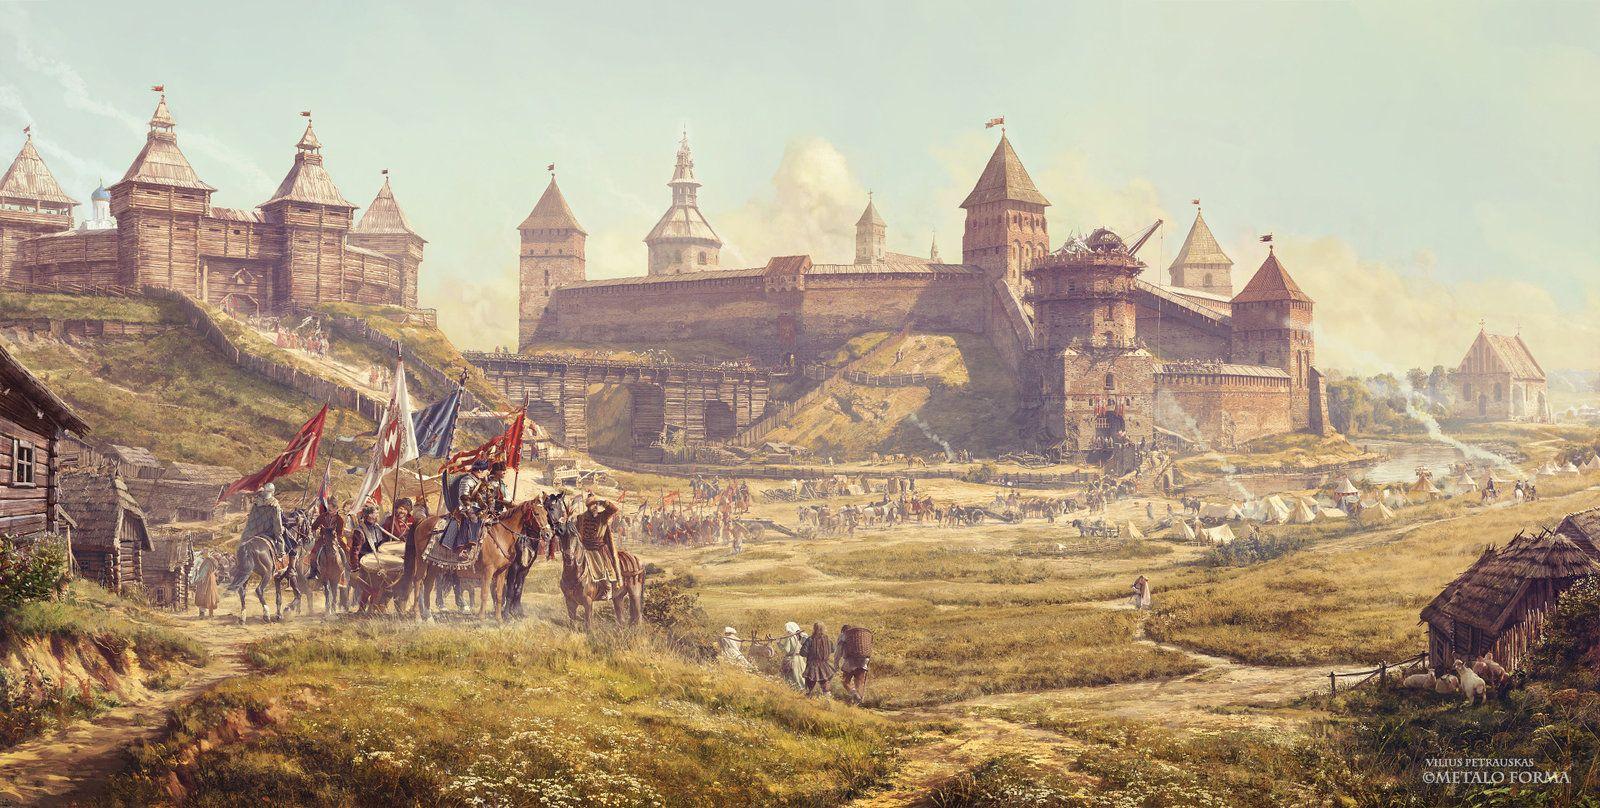 The Day Before Kleckas Battle, Vilius Petrauskas on ArtStation at https://www.artstation.com/artwork/the-day-before-kleckas-battle-ee2934c4-ba32-46d1-9657-e742eb6ccf64